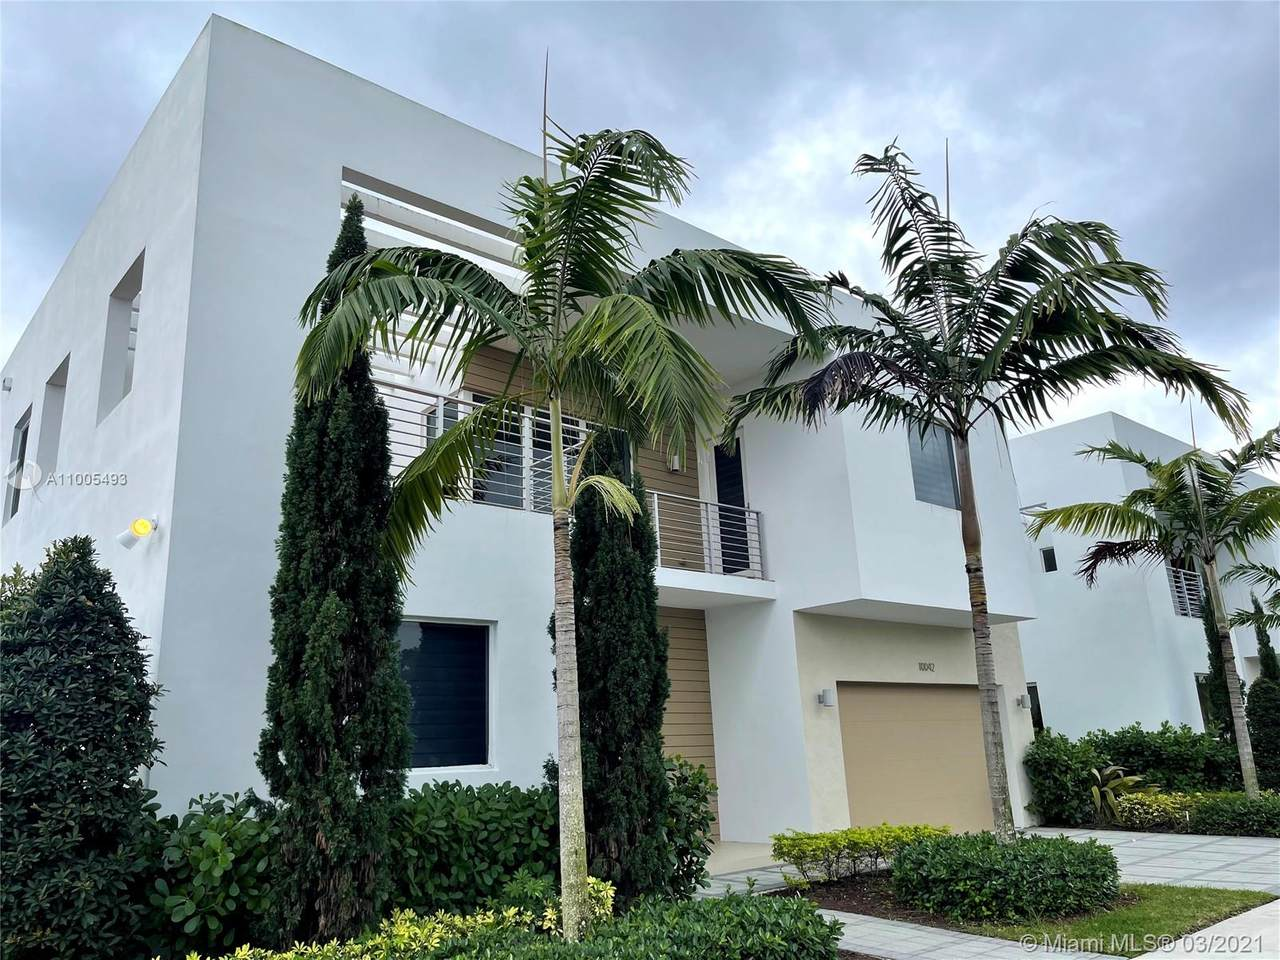 10042 76th Terrace - Photo 1